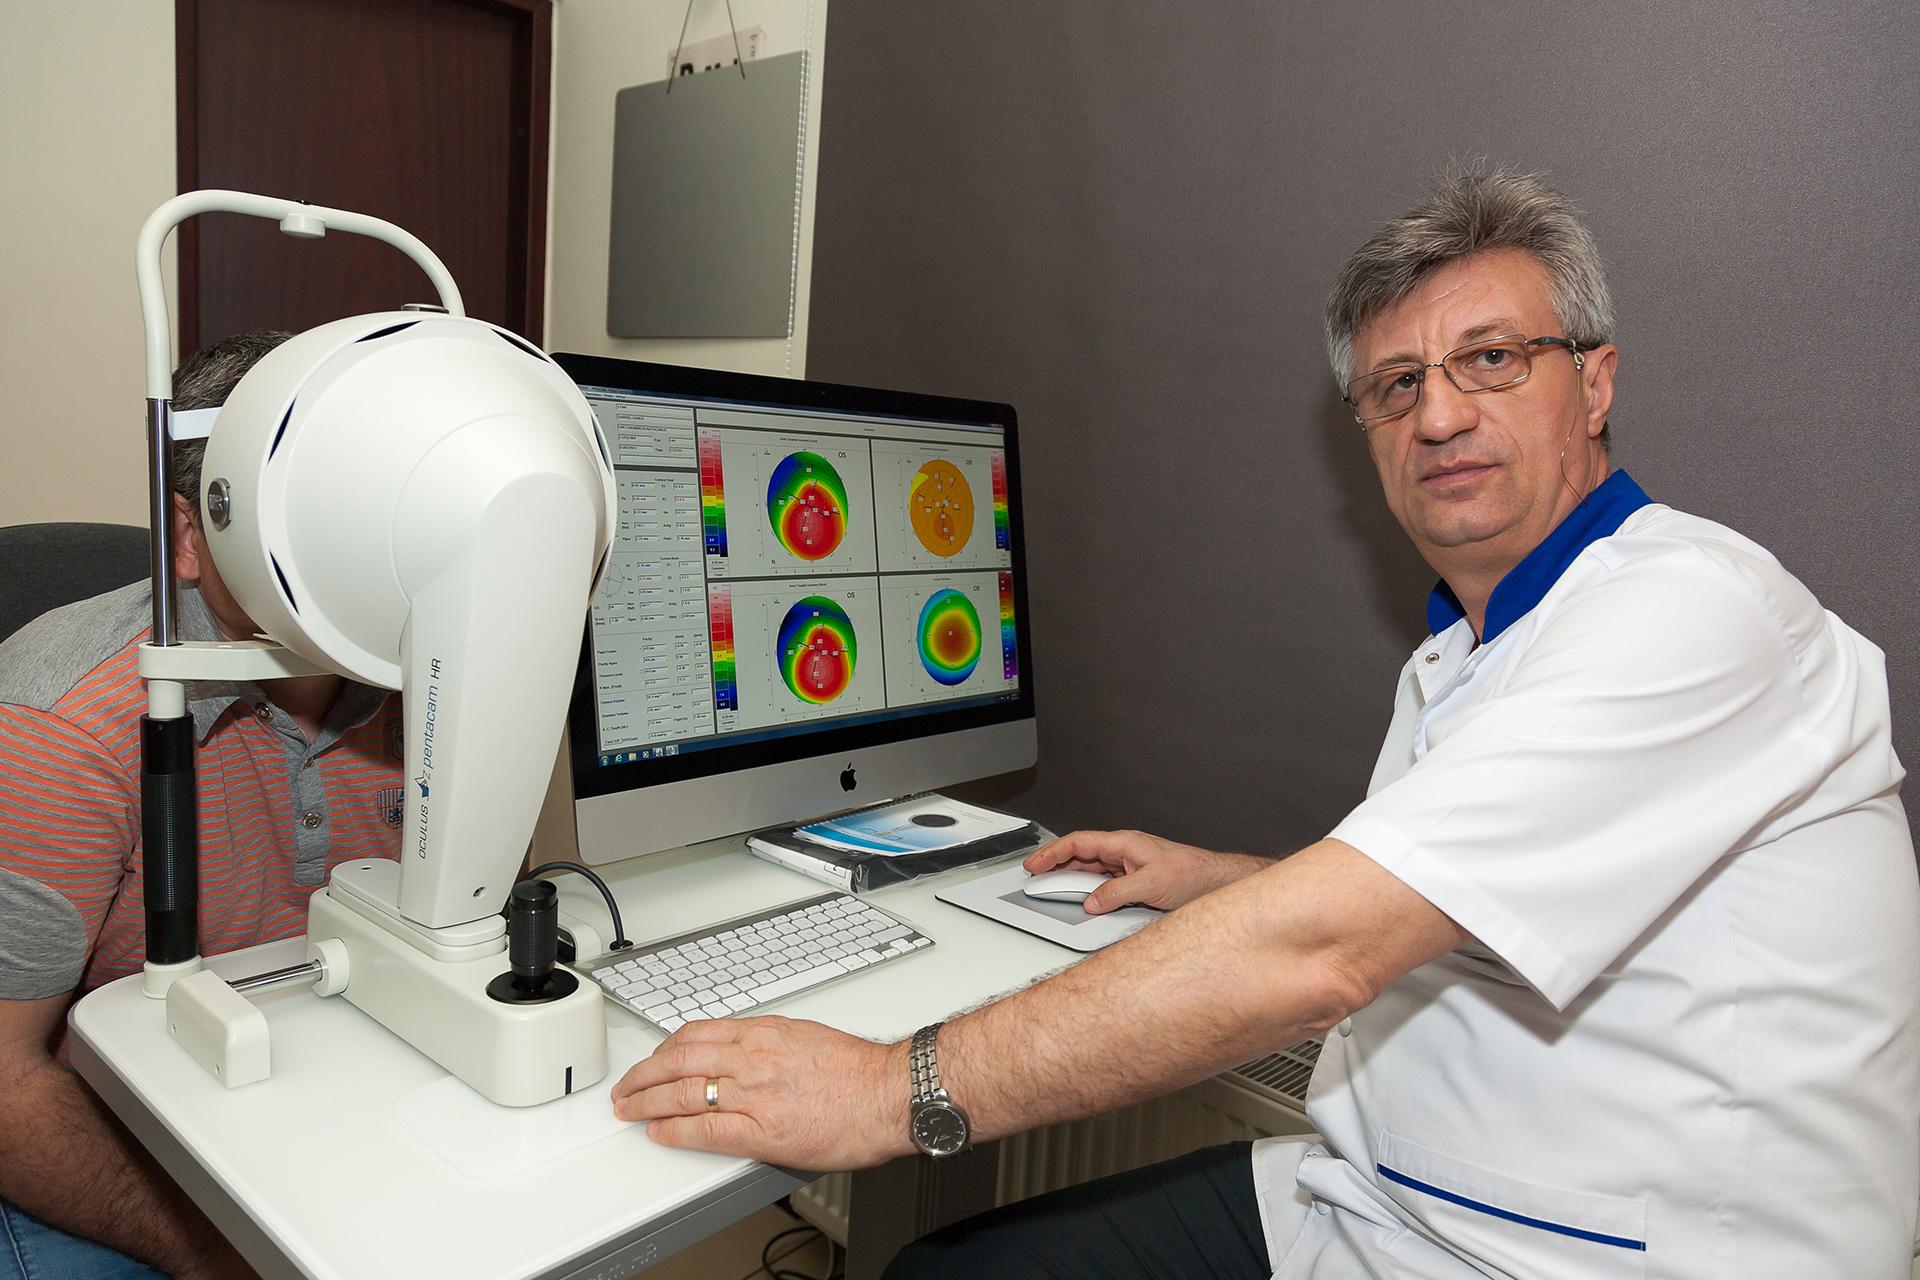 Dr Diaconu